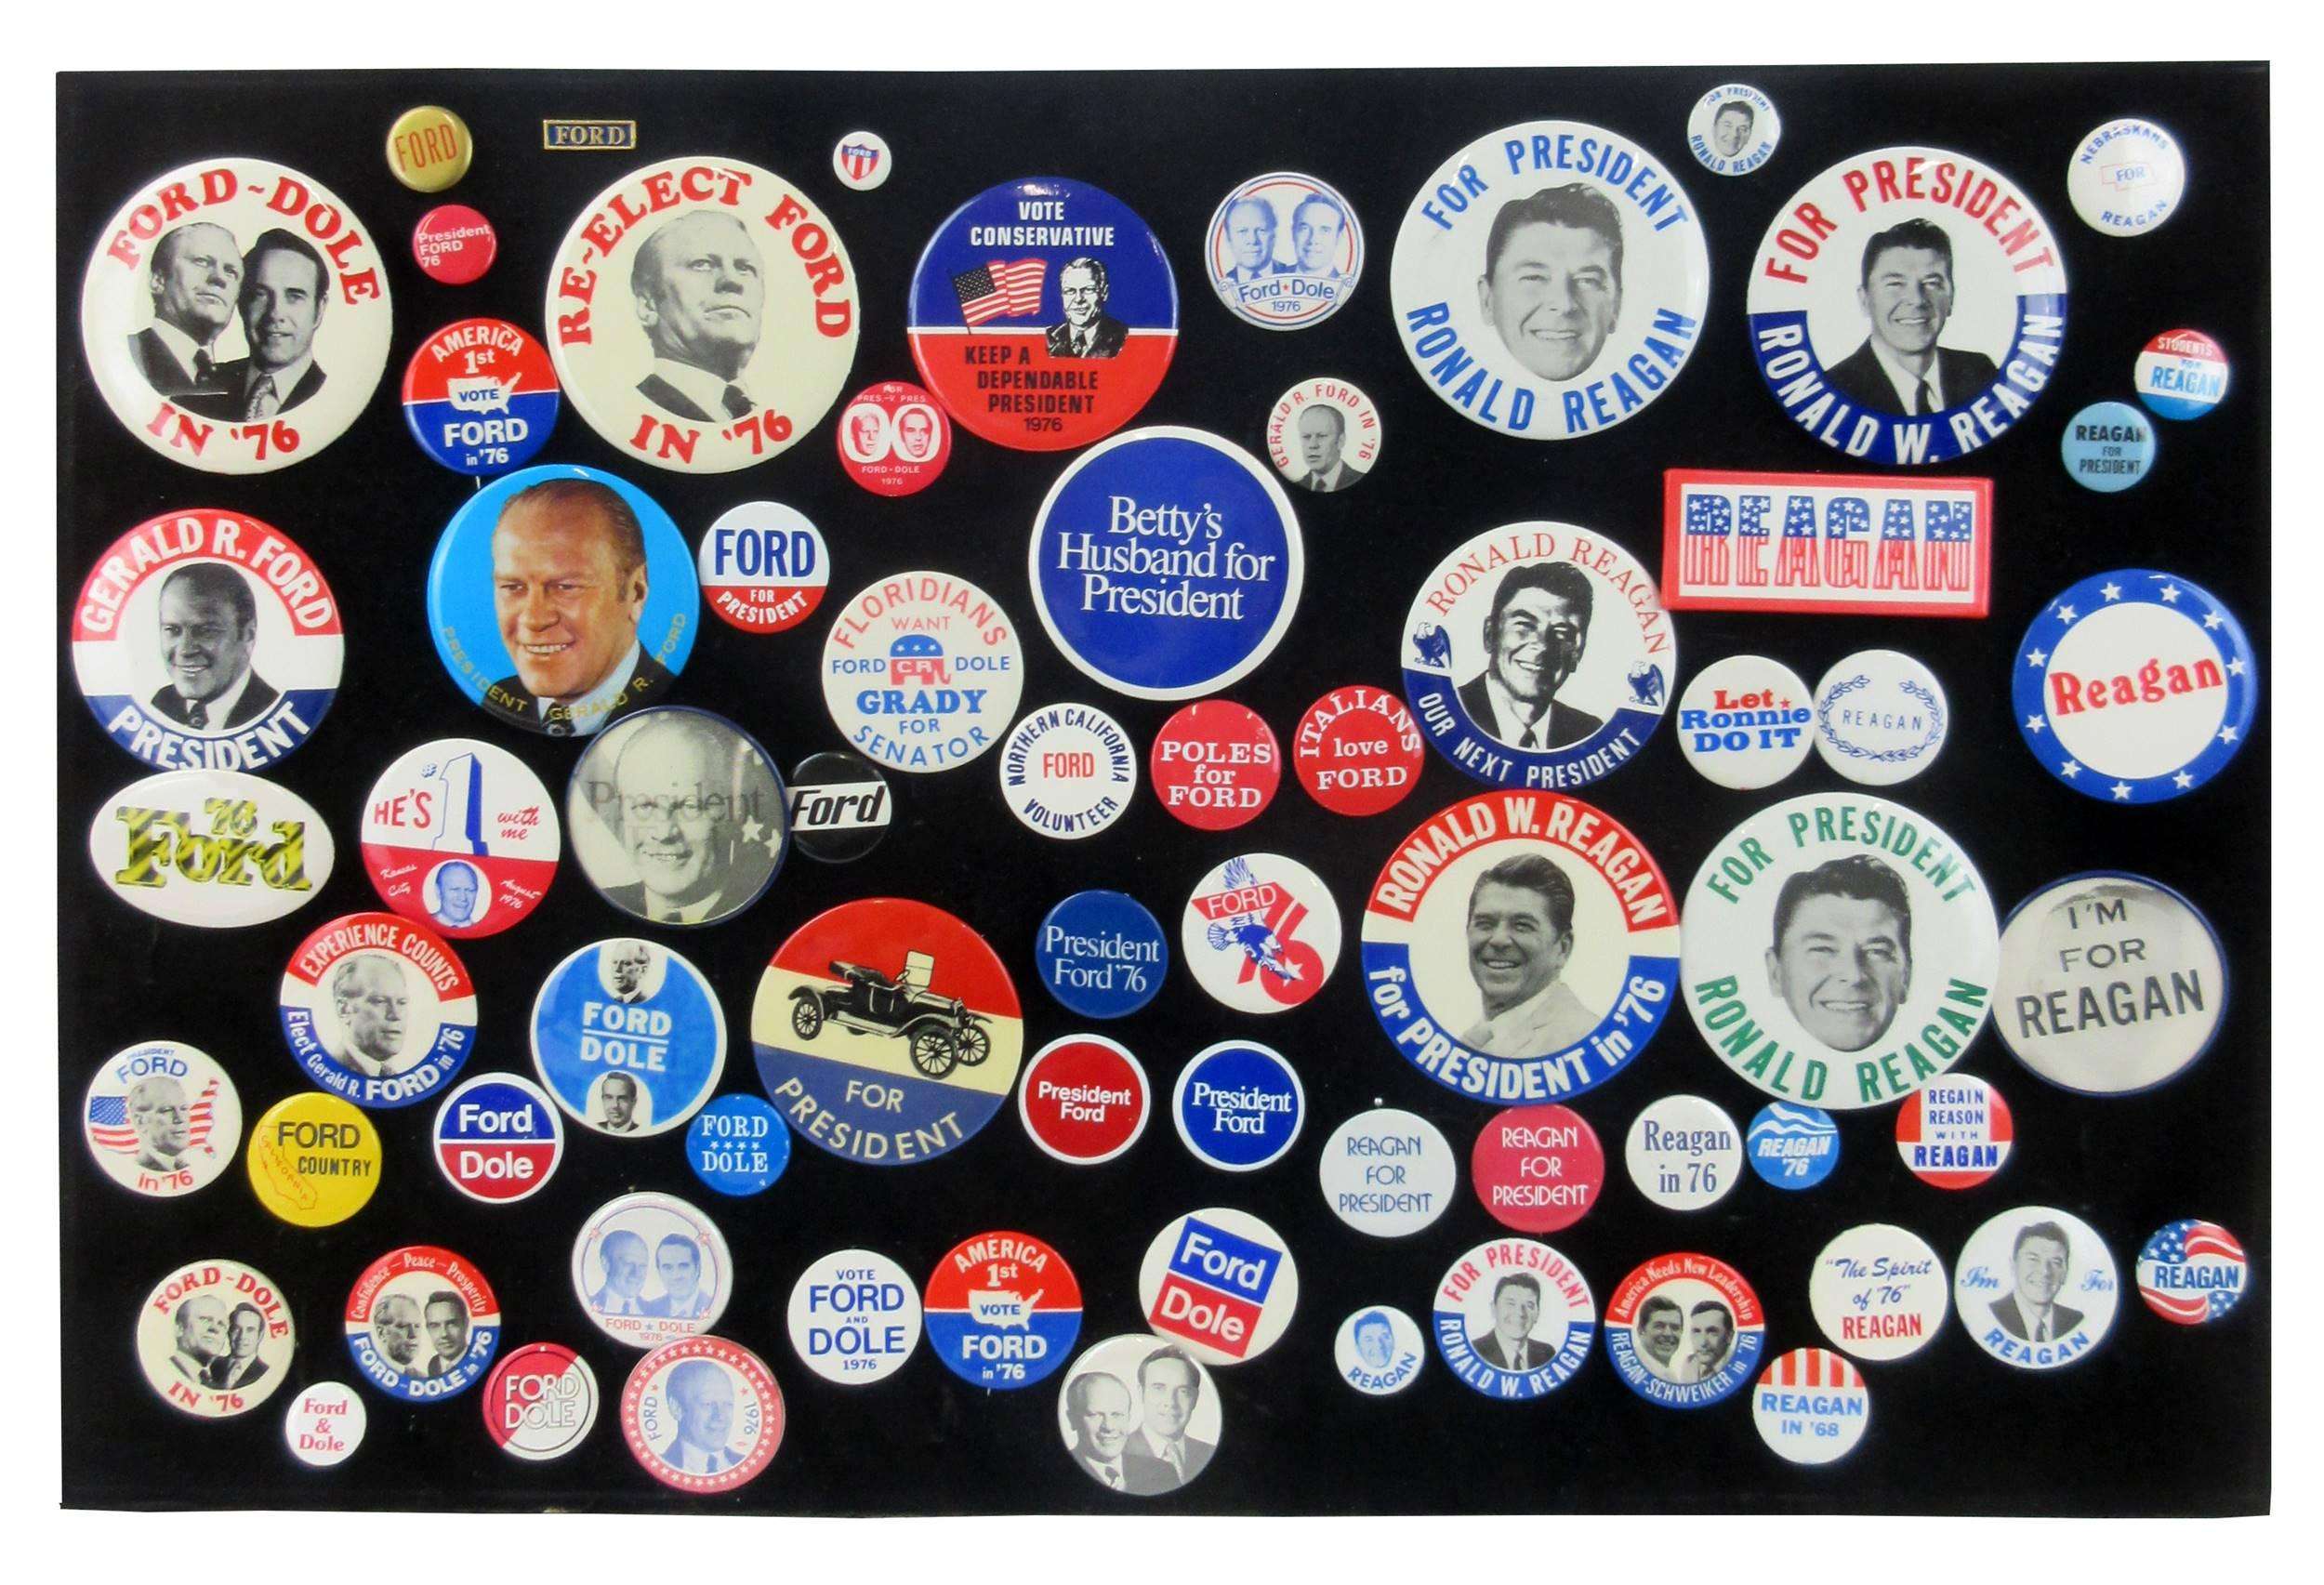 Gerald Ford, Ronald Reagan 1976 Presidential Campaign Pinbacks & Memorabilia, 65+ Pcs